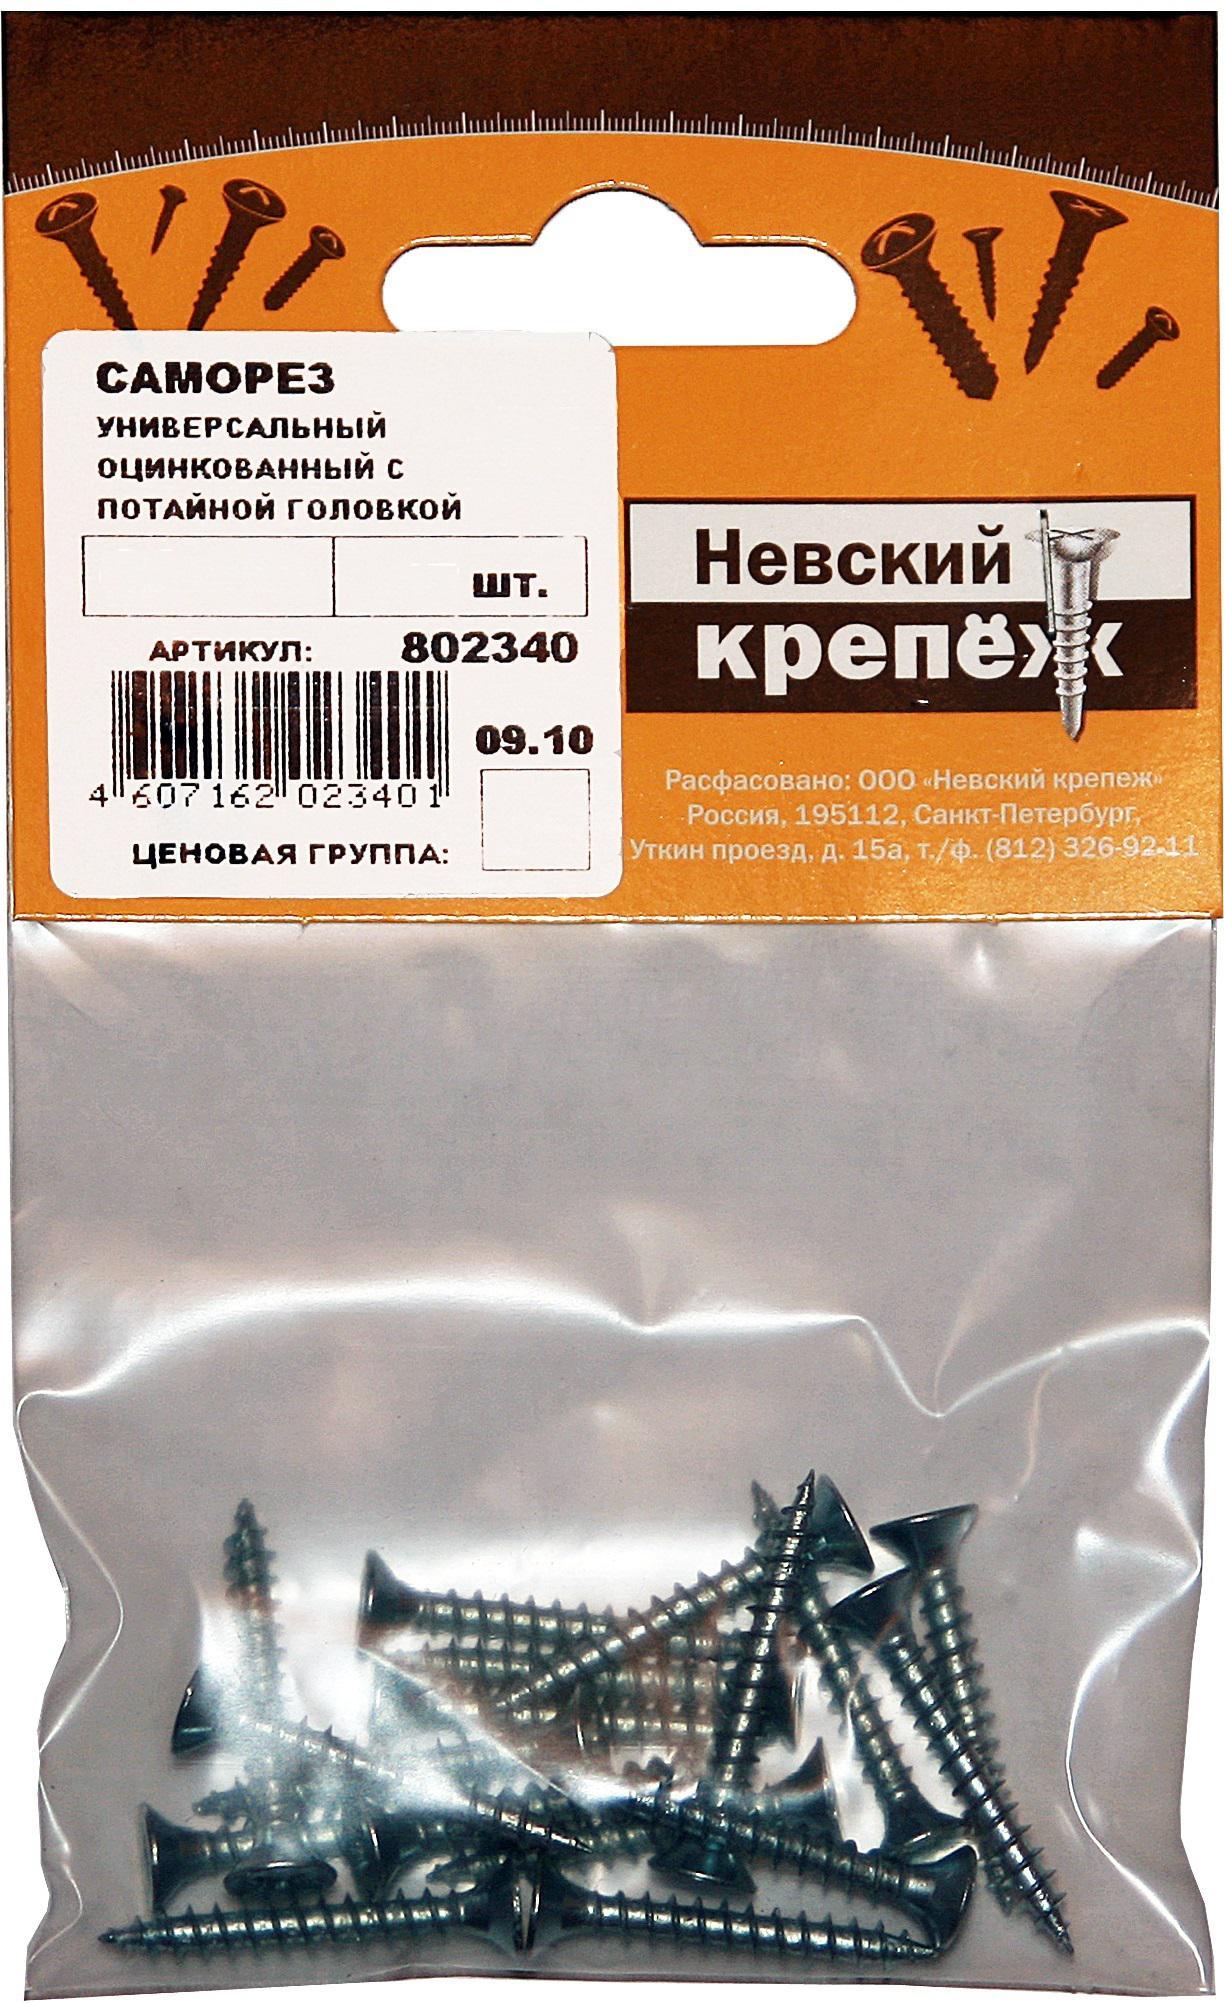 Саморез НЕВСКИЙ КРЕПЕЖ 802340